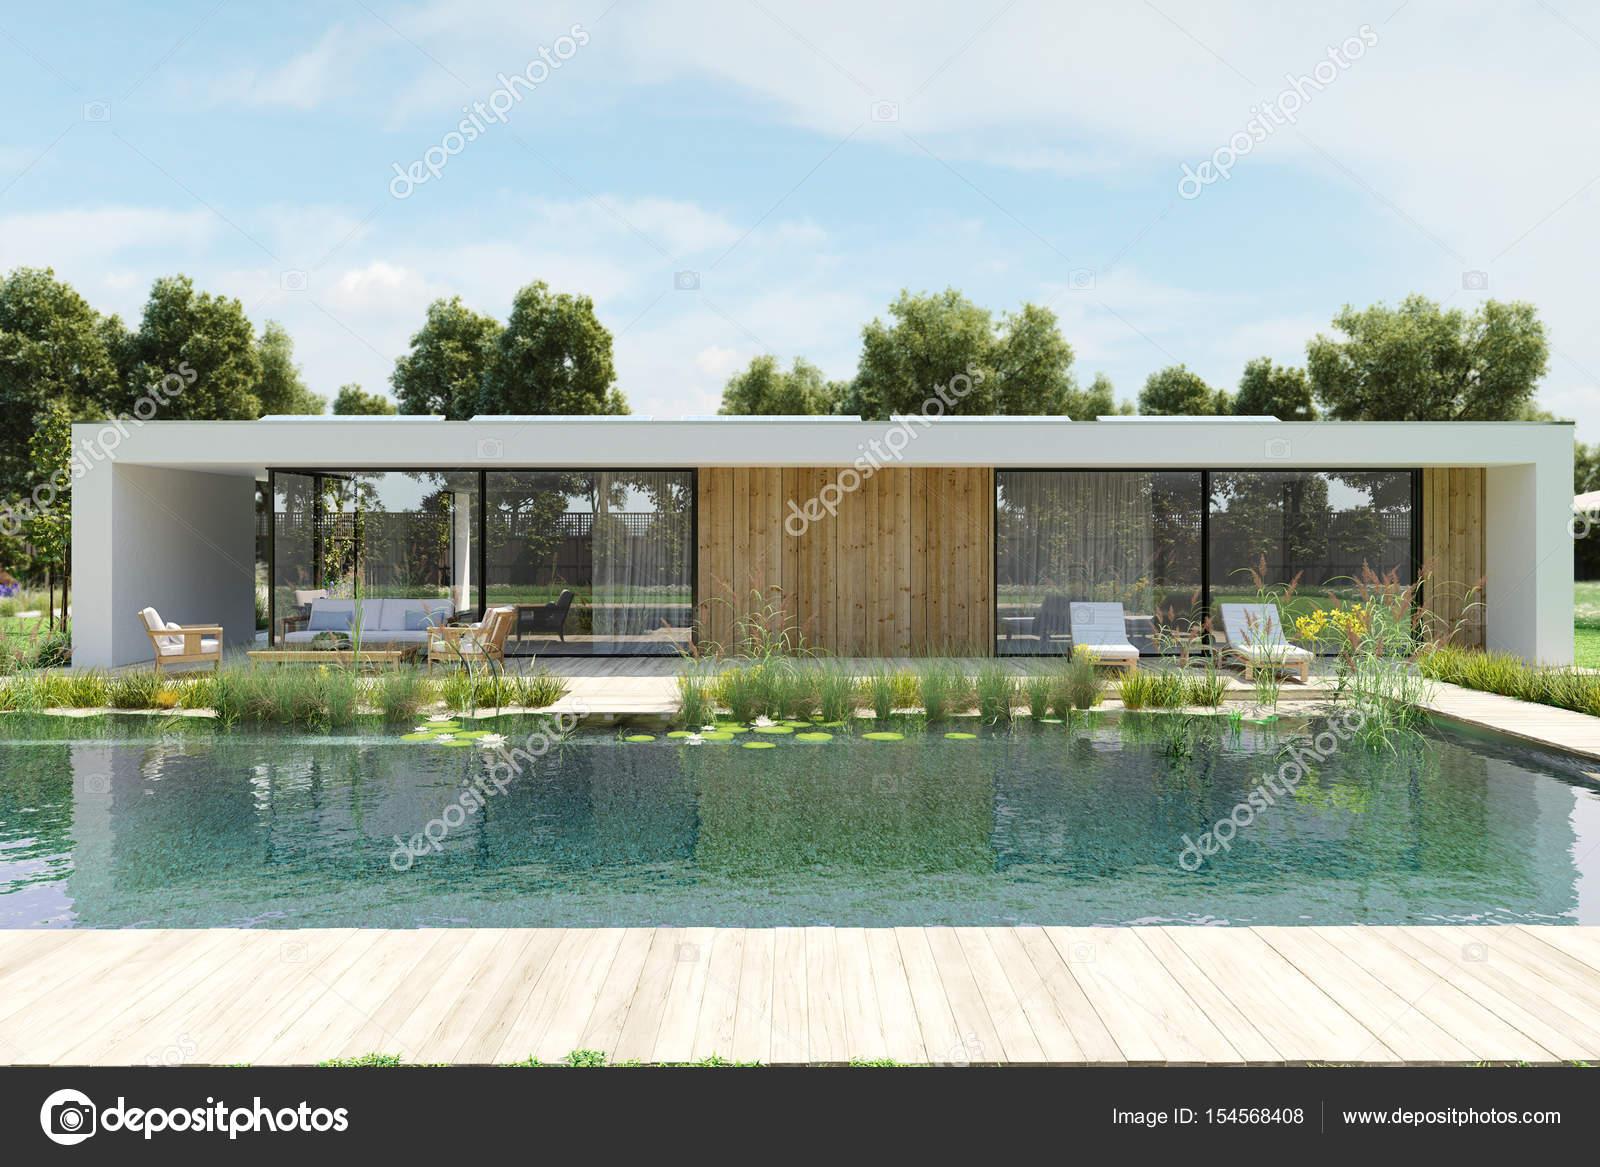 Casa moderna con piscina ambientale rendering 3d foto for Casa moderna piscina